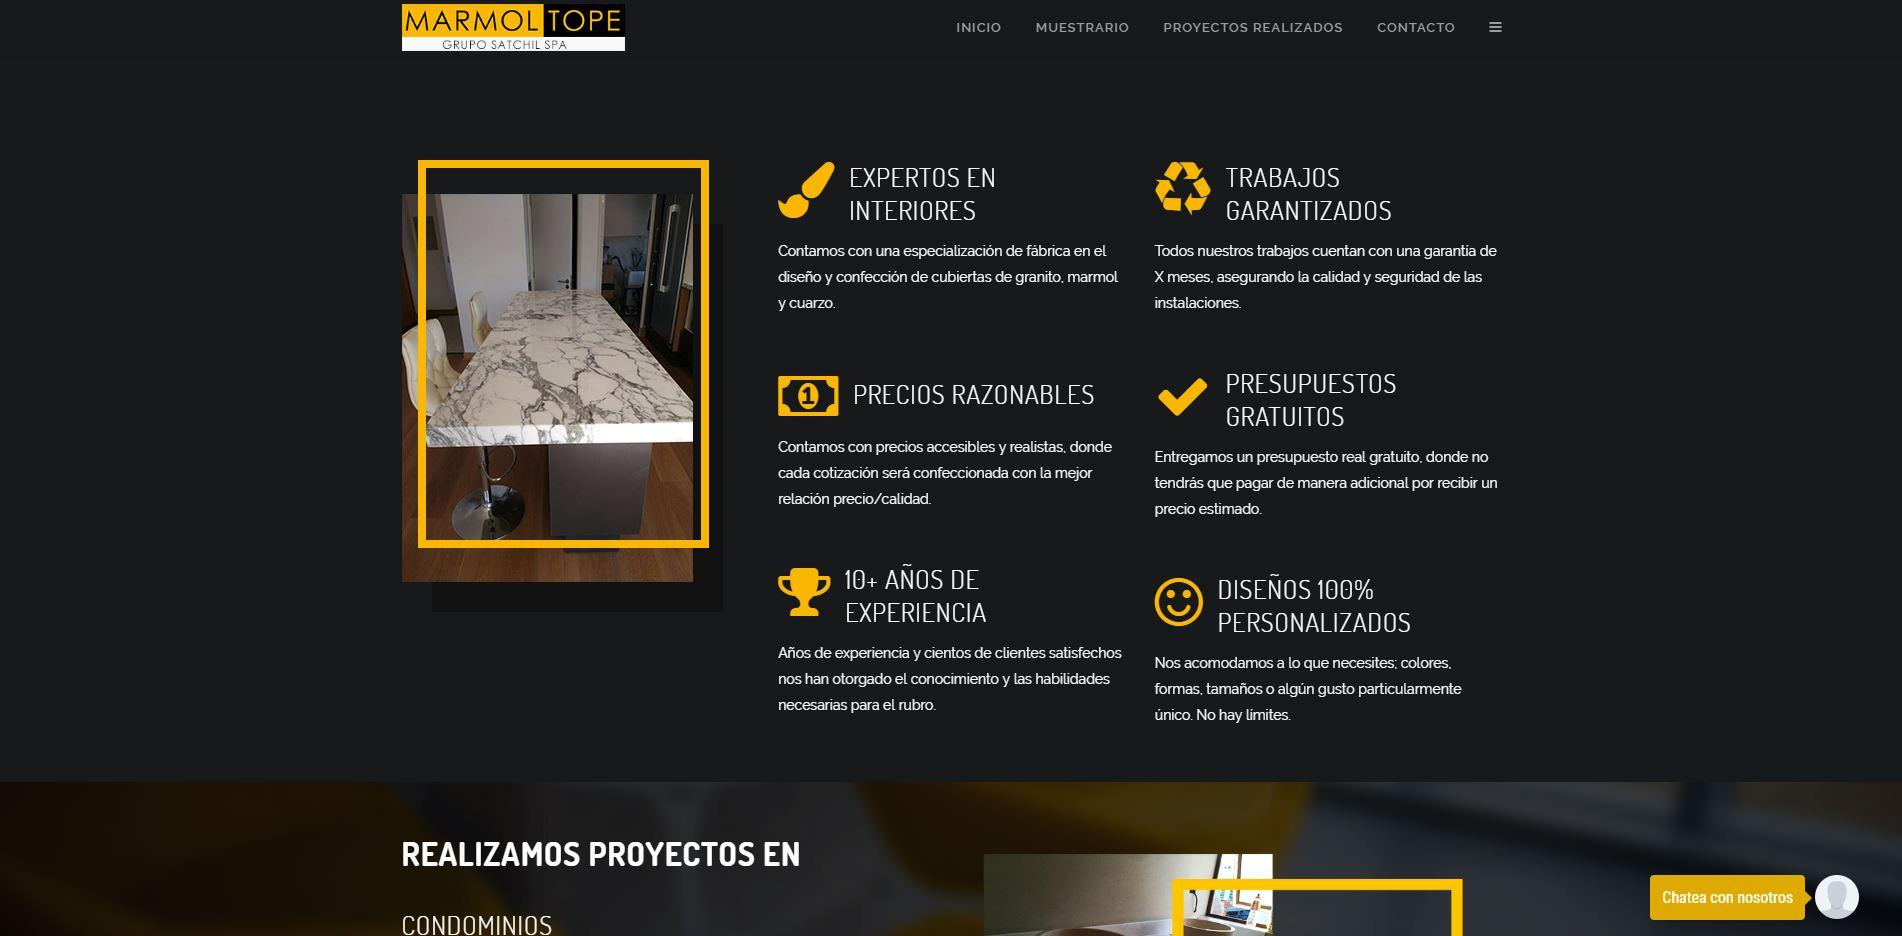 Marmoltope.cl - Tiweb - Pagina Web Autoadministrable - Posicionamiento Web